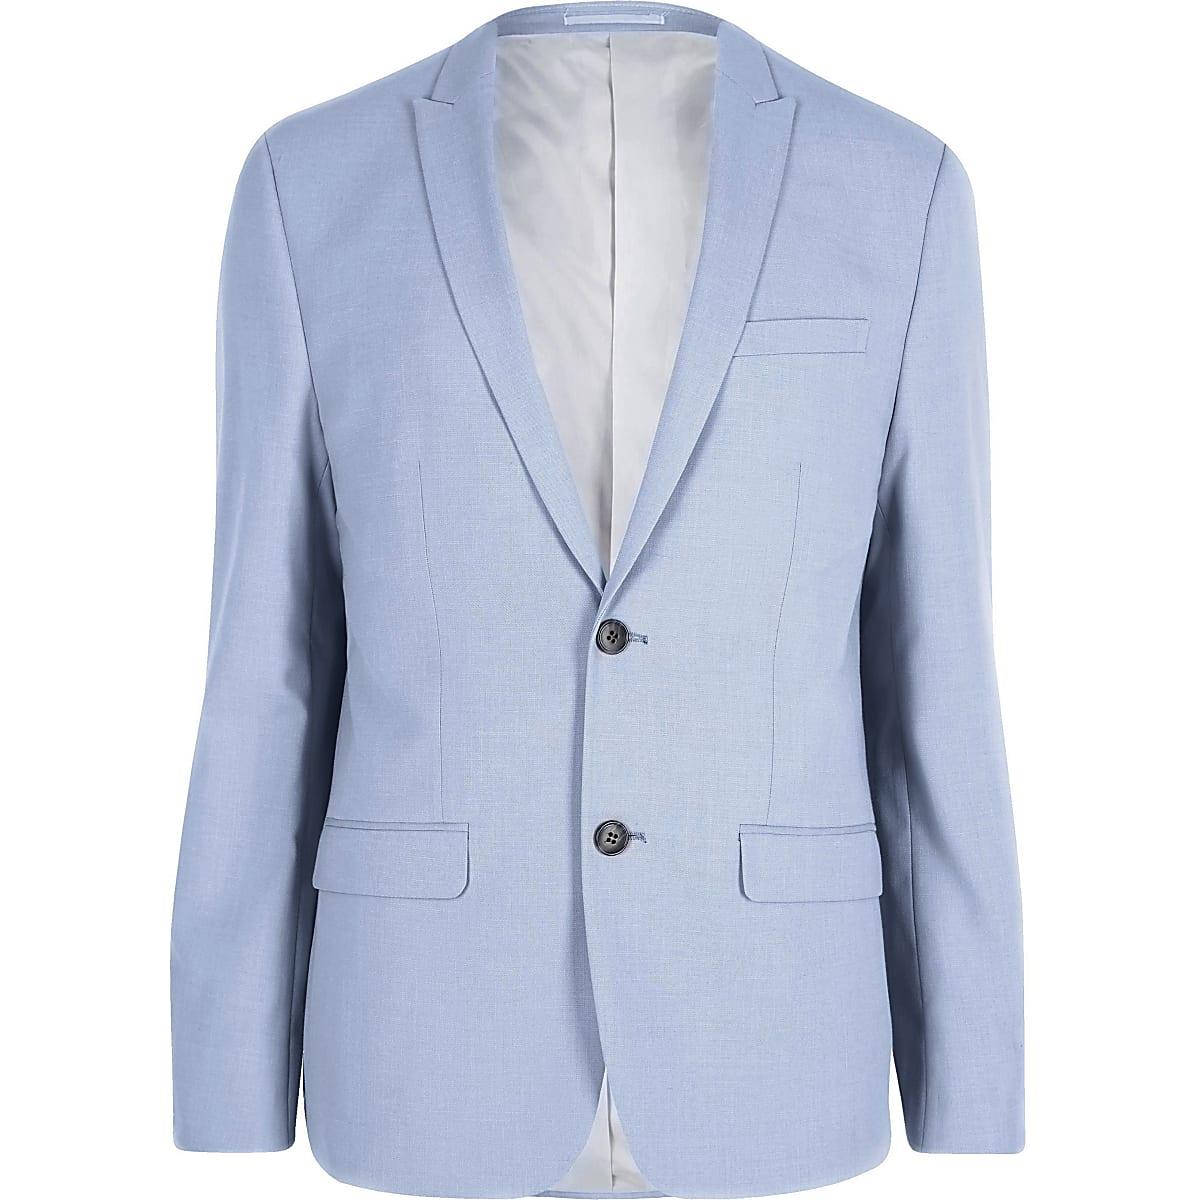 Blue skinny fit suit jacket